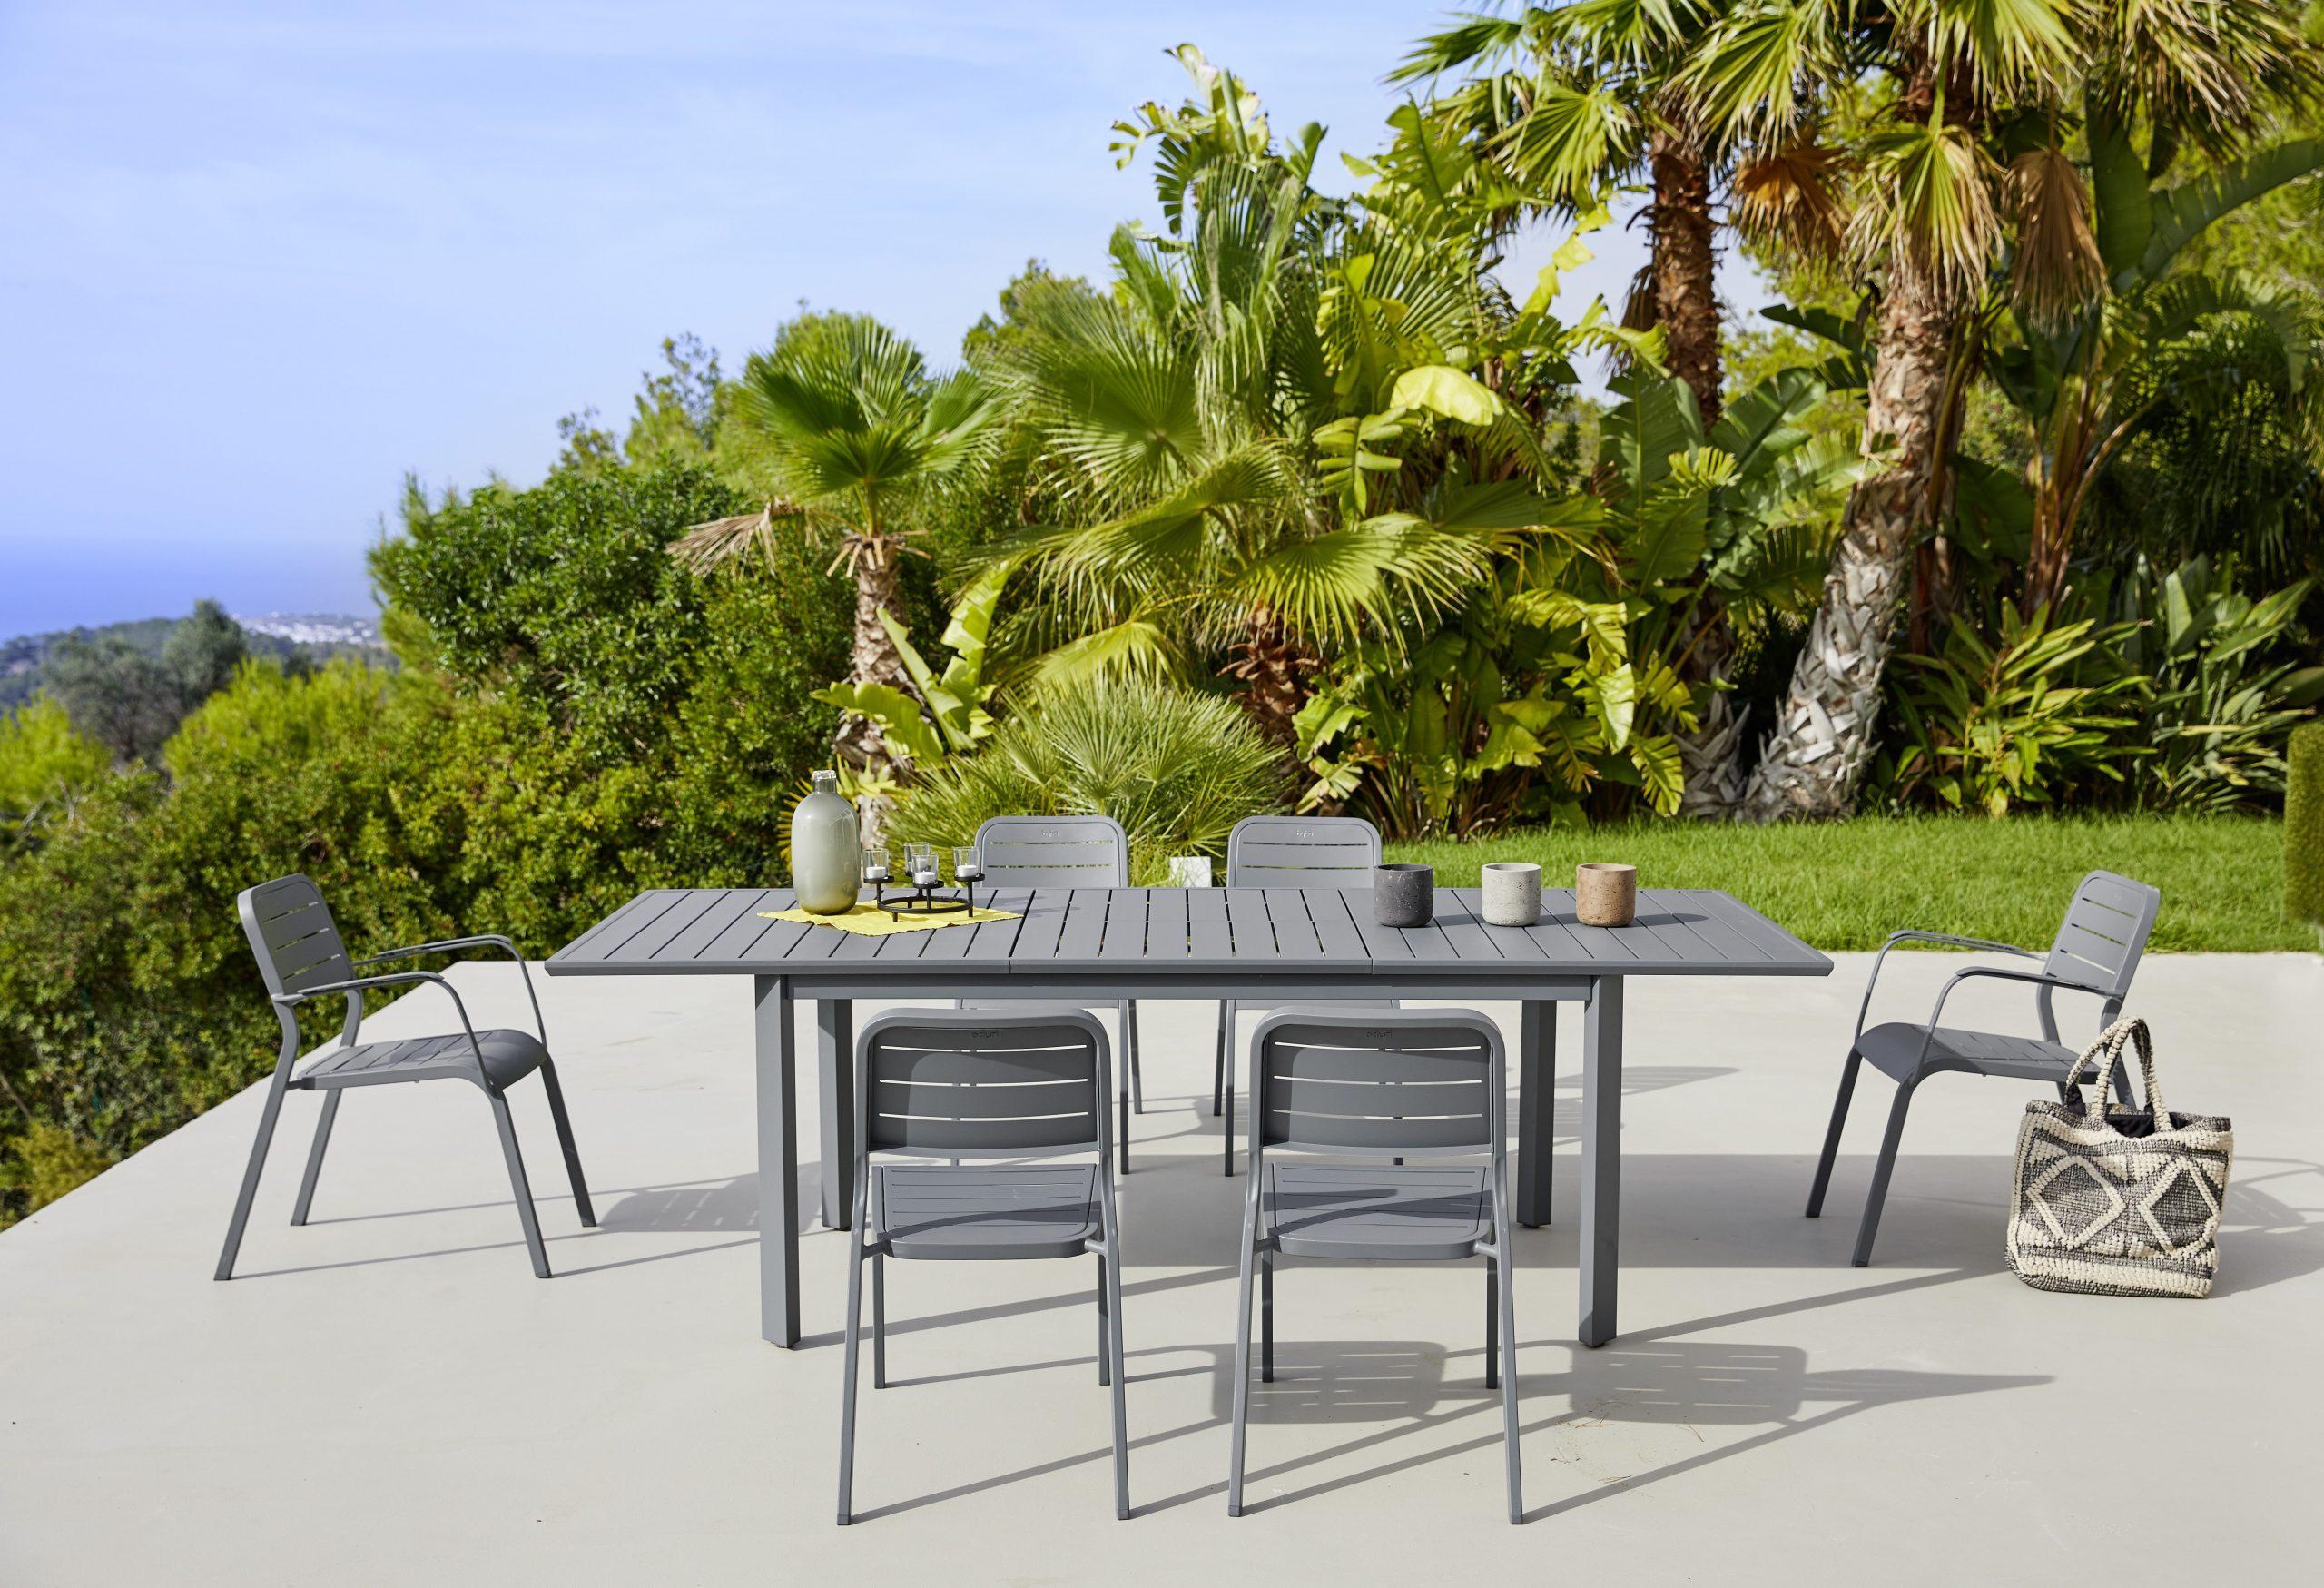 Evenements Jardin   Table De Jardin Alu, Mobilier Jardin Et ... dedans Table De Jardin Pliante Carrefour